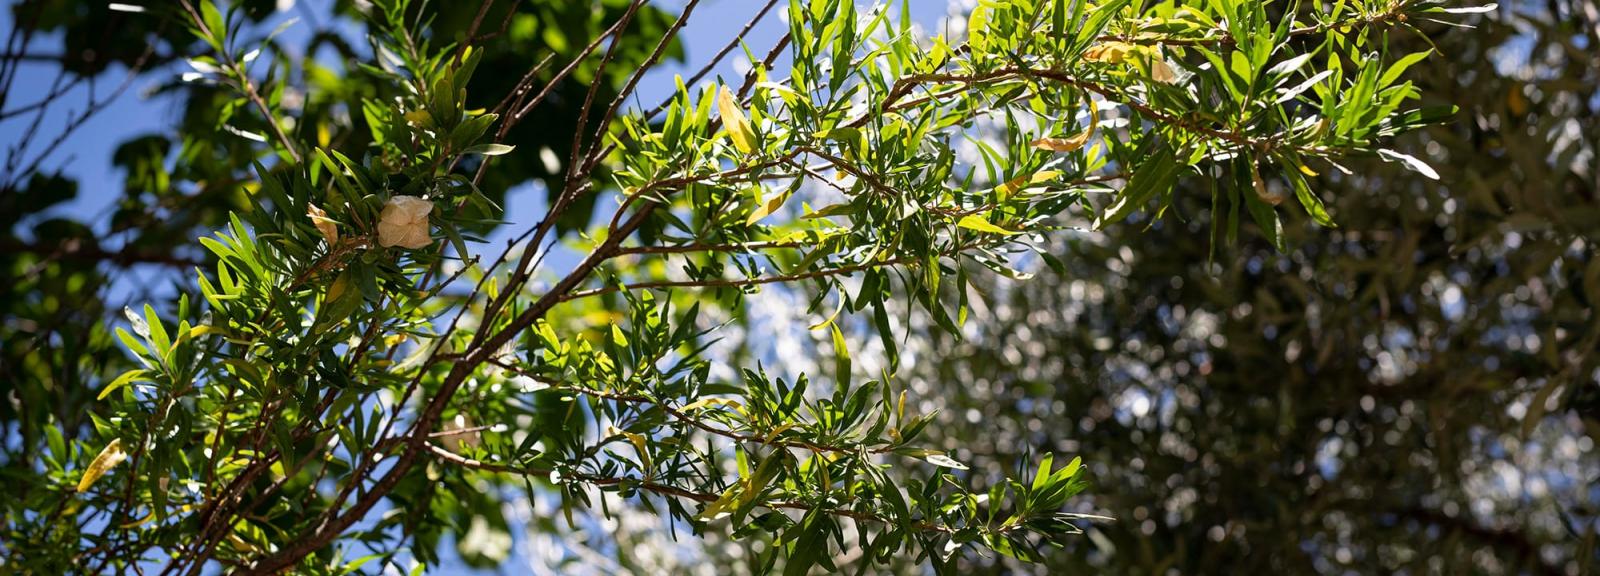 Lanternes chinoises (Nymania capensis) - Jardin botanique Val Rahmeh-Menton © MNHN - Agnès Iatzoura